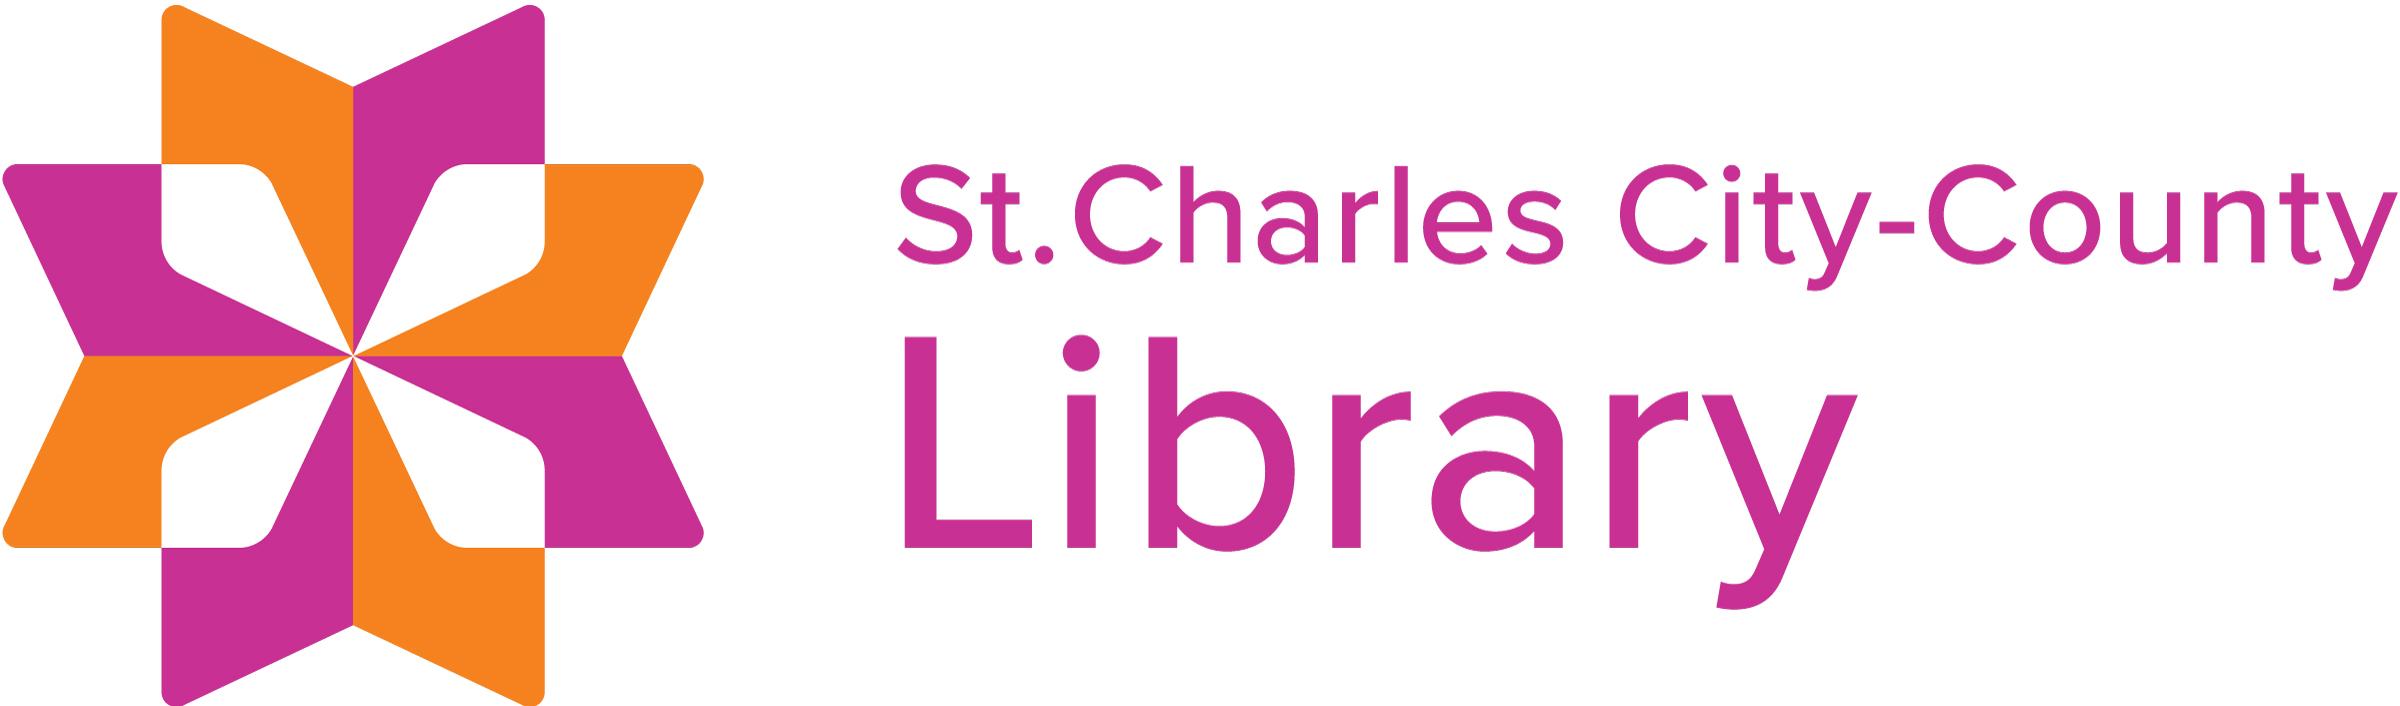 new logo may 2017 Library Dist